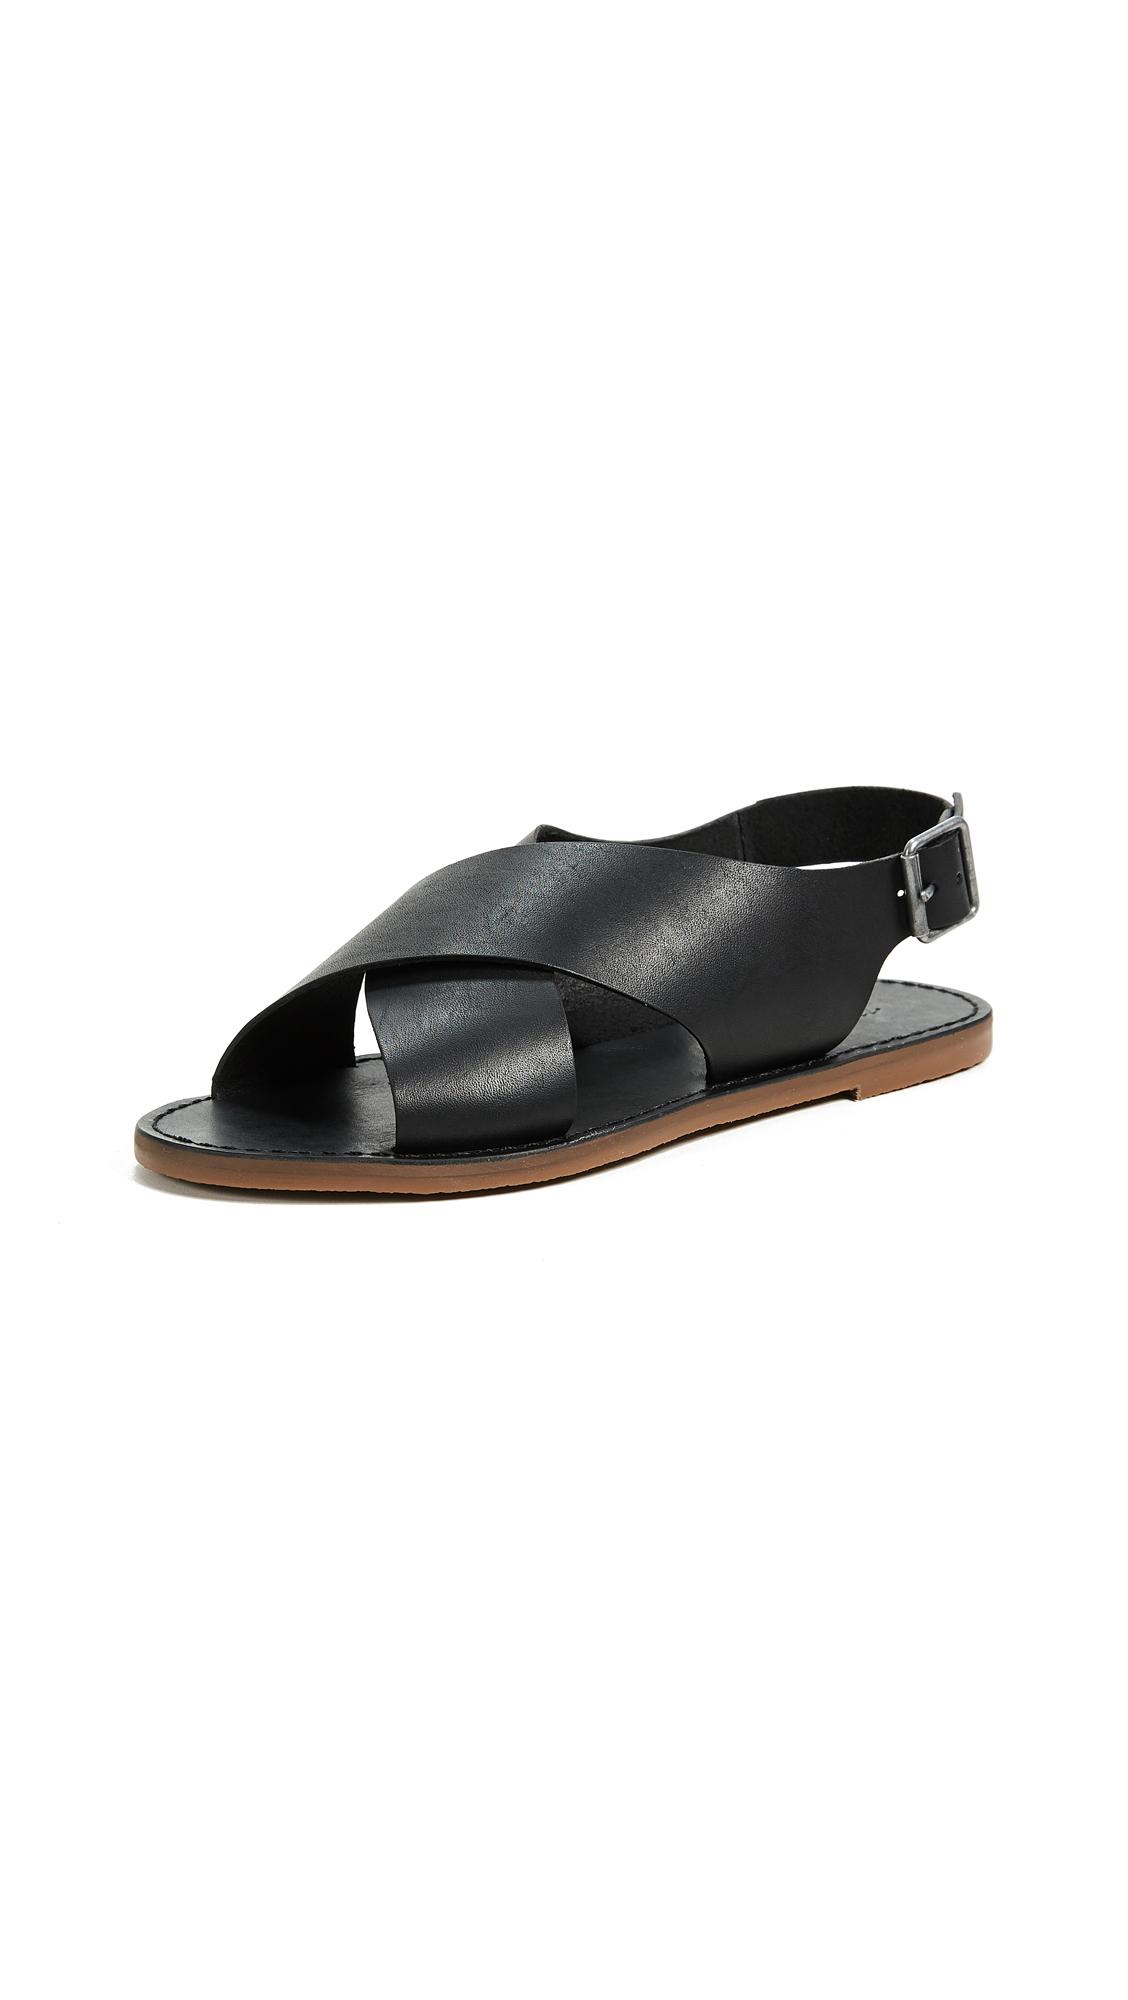 Madewell Reka Crisscross Outstock Sandals - True Black